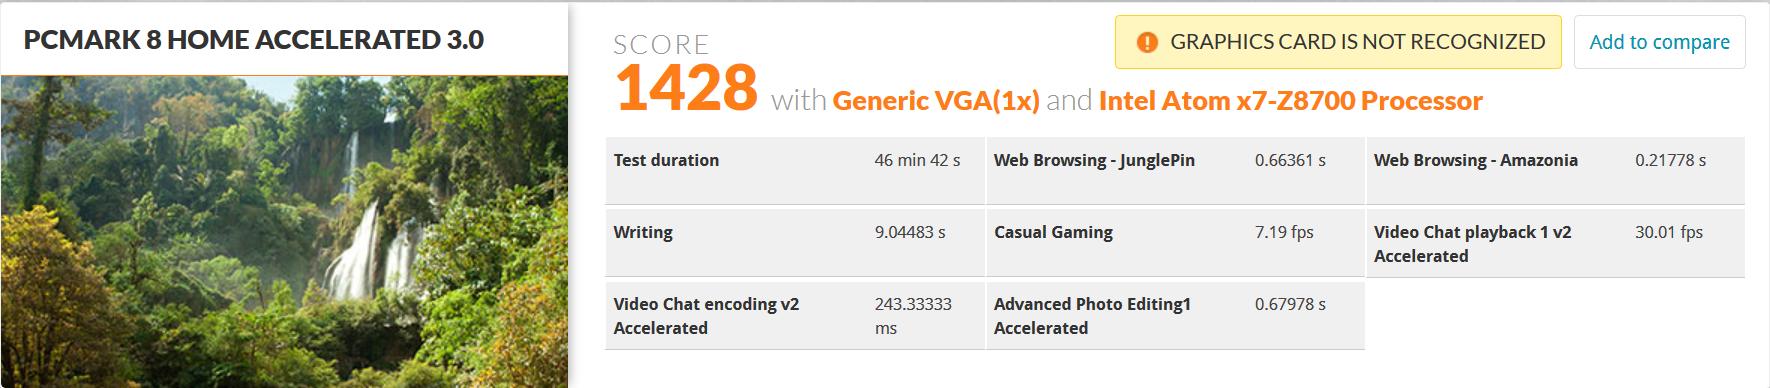 Voyo_V3_PCMARK8_Accelerated